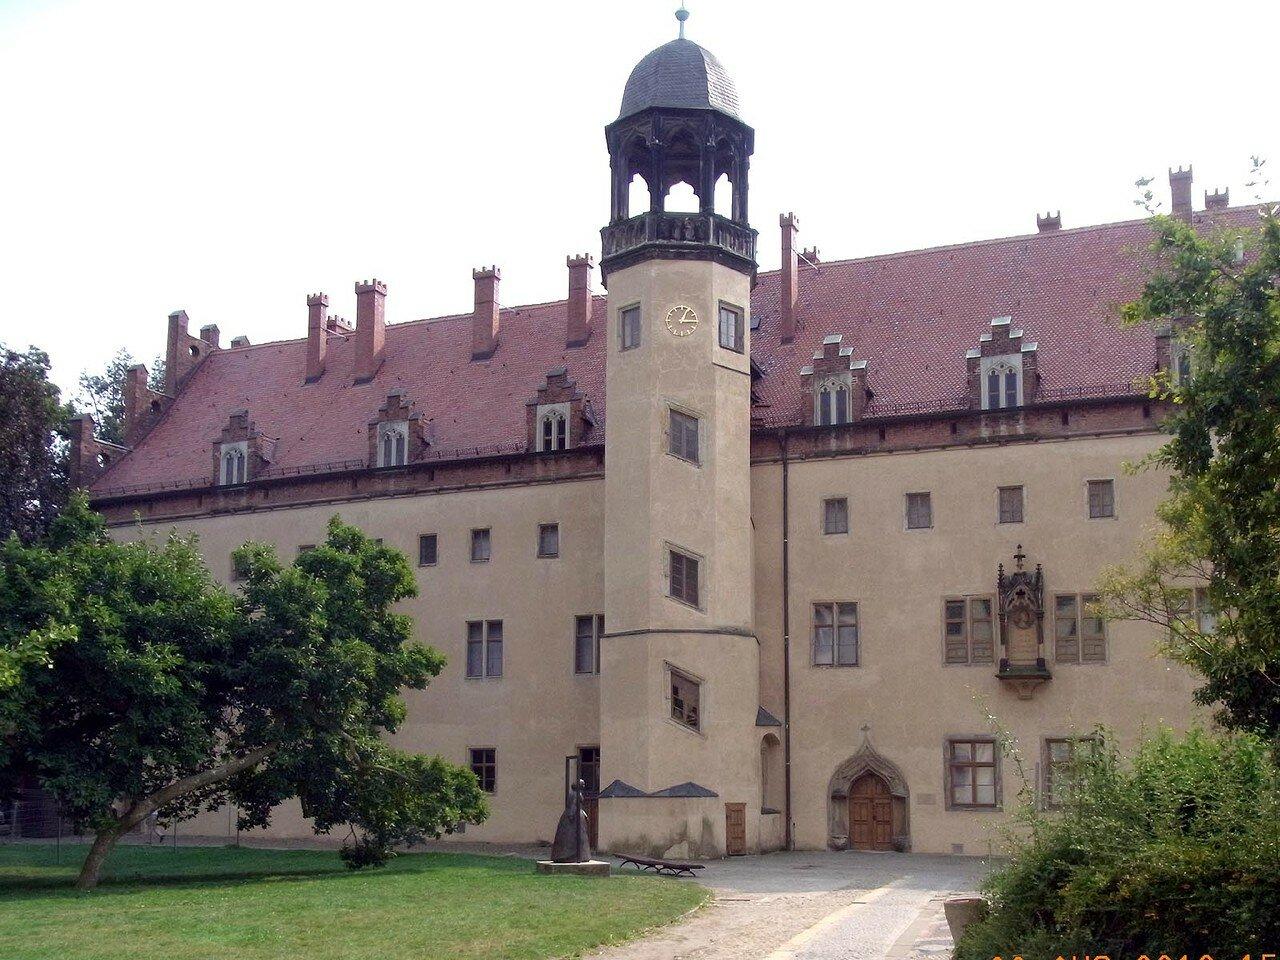 Wittenberg_Lutherhaus_1_1600.jpg